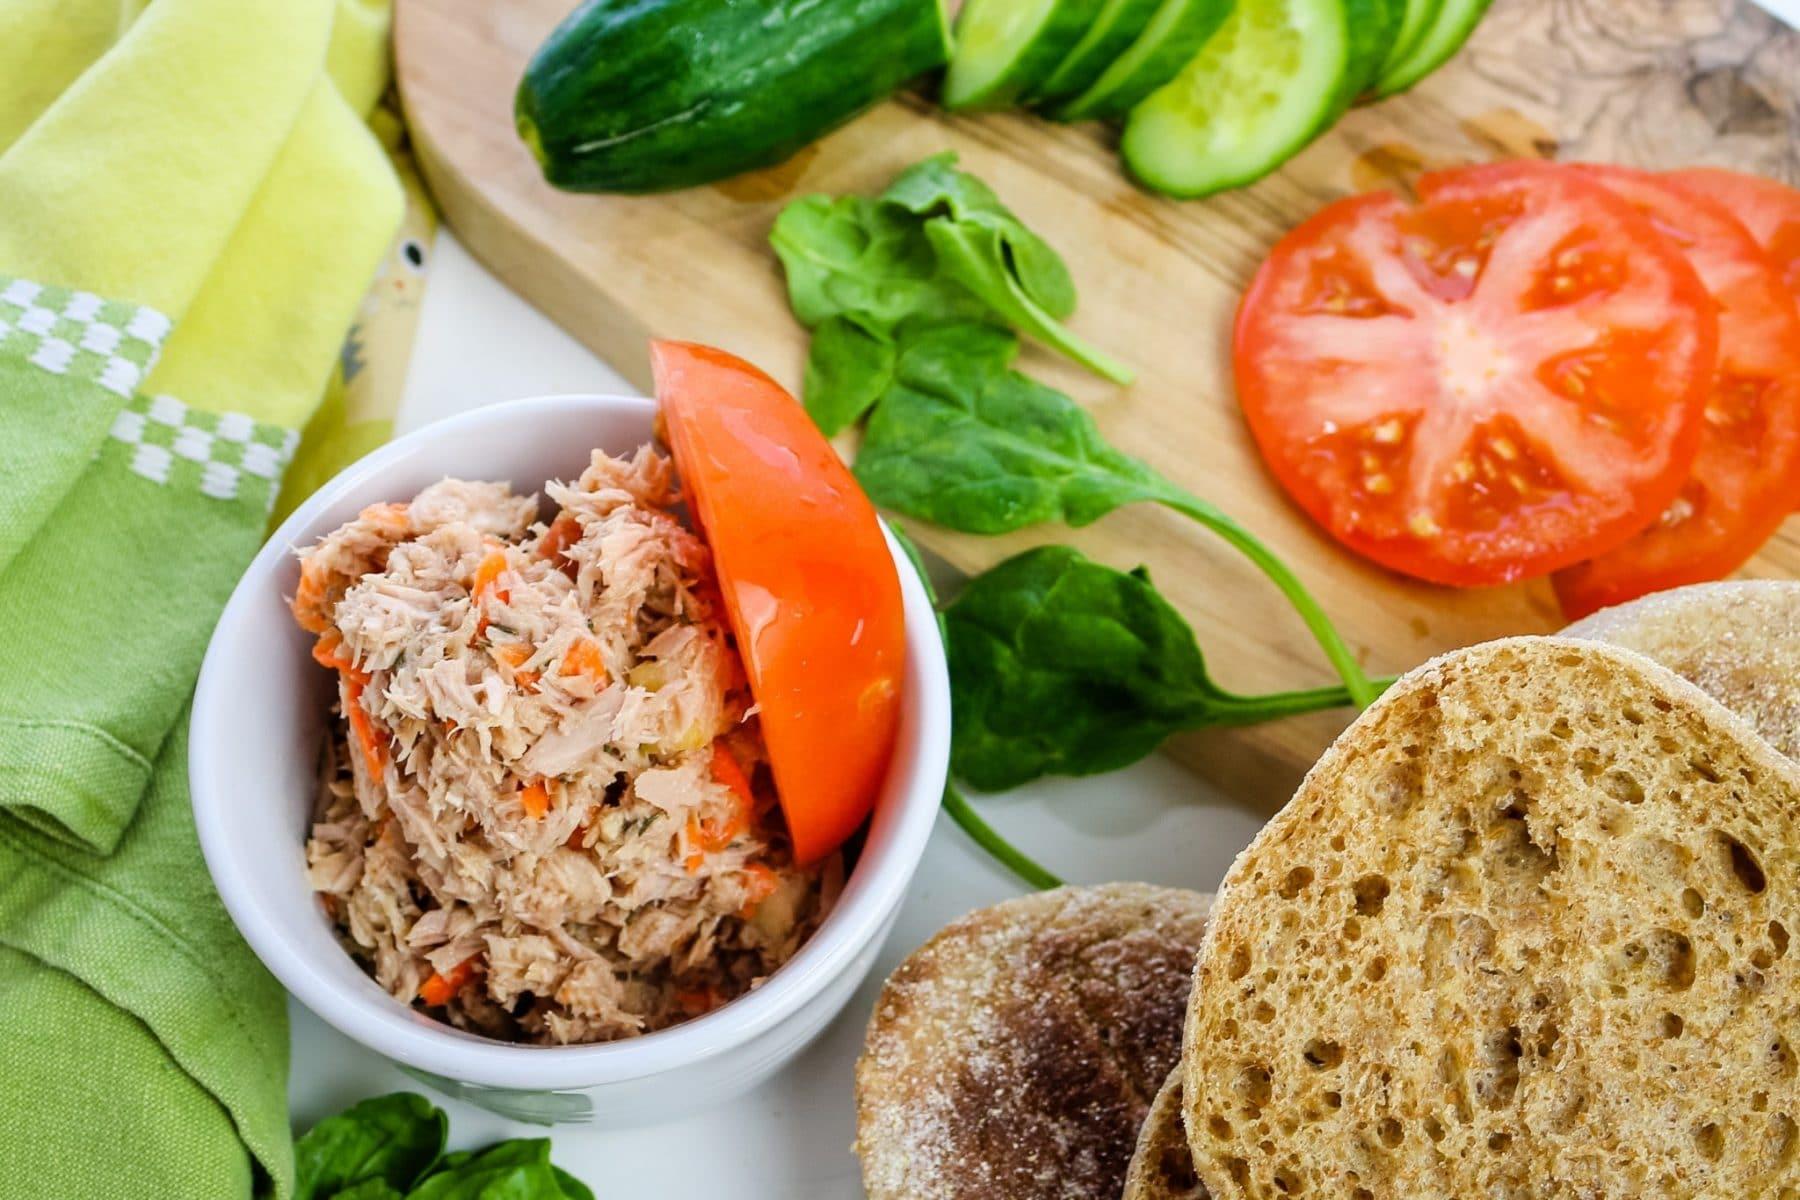 tuna salad in a bowl with tomato slice